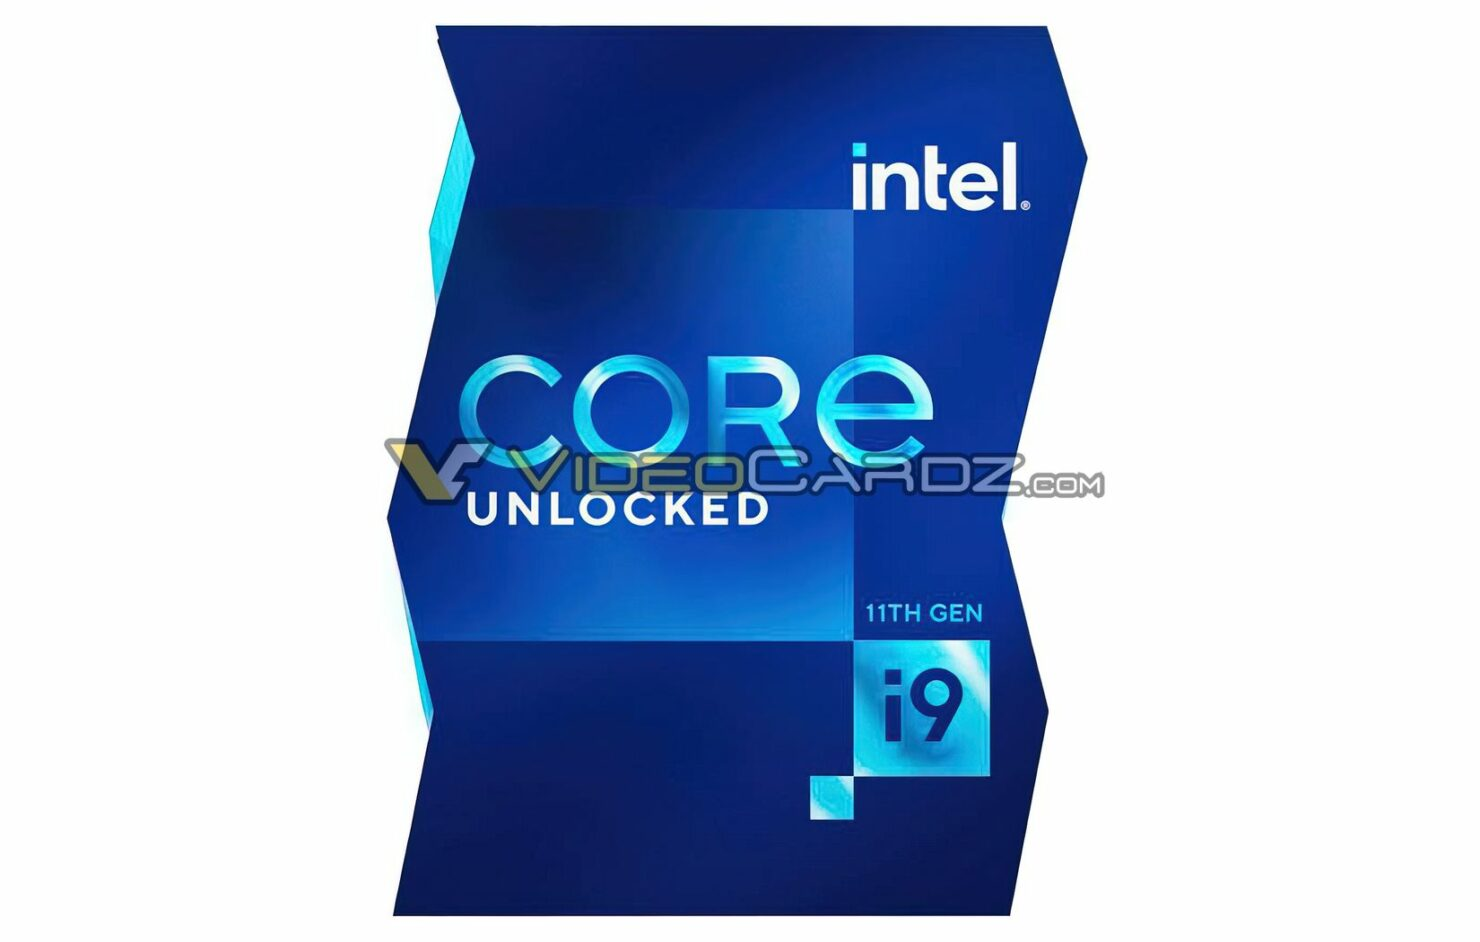 intel-core-i9-11900k-rocket-lake-desktop-cpu-_2